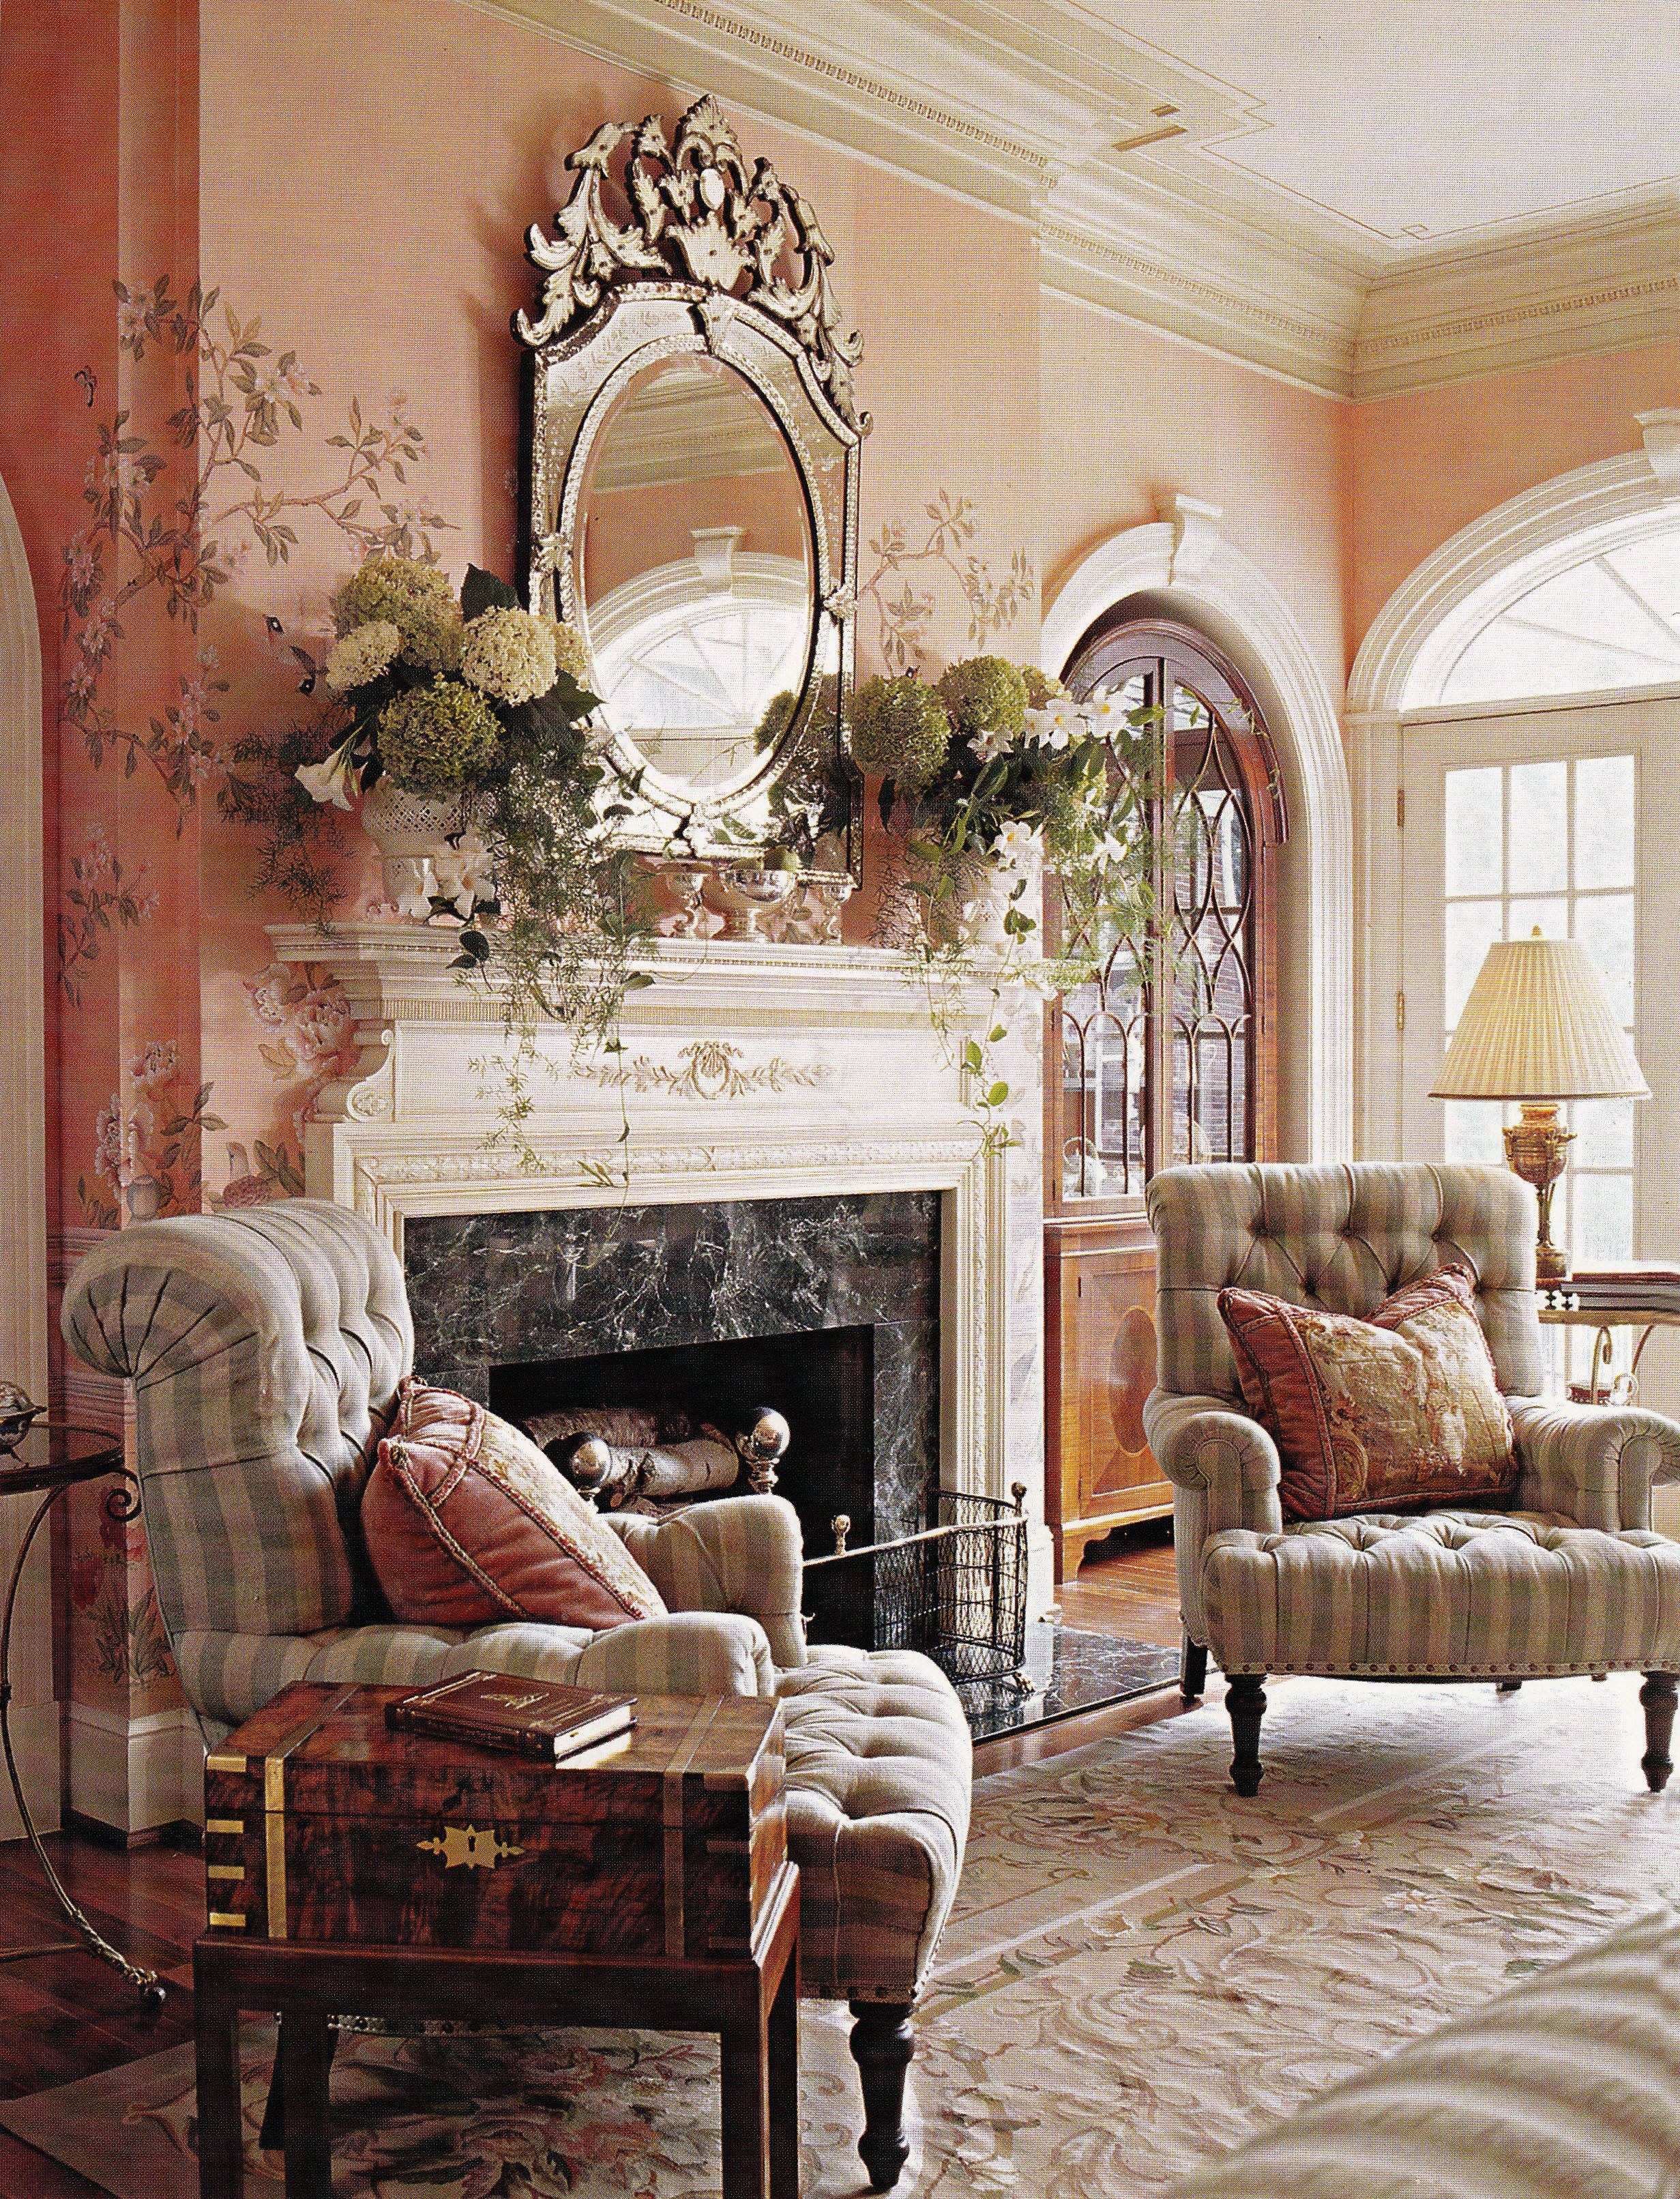 New york interior designer marshall watson st louis for St louis interior designers